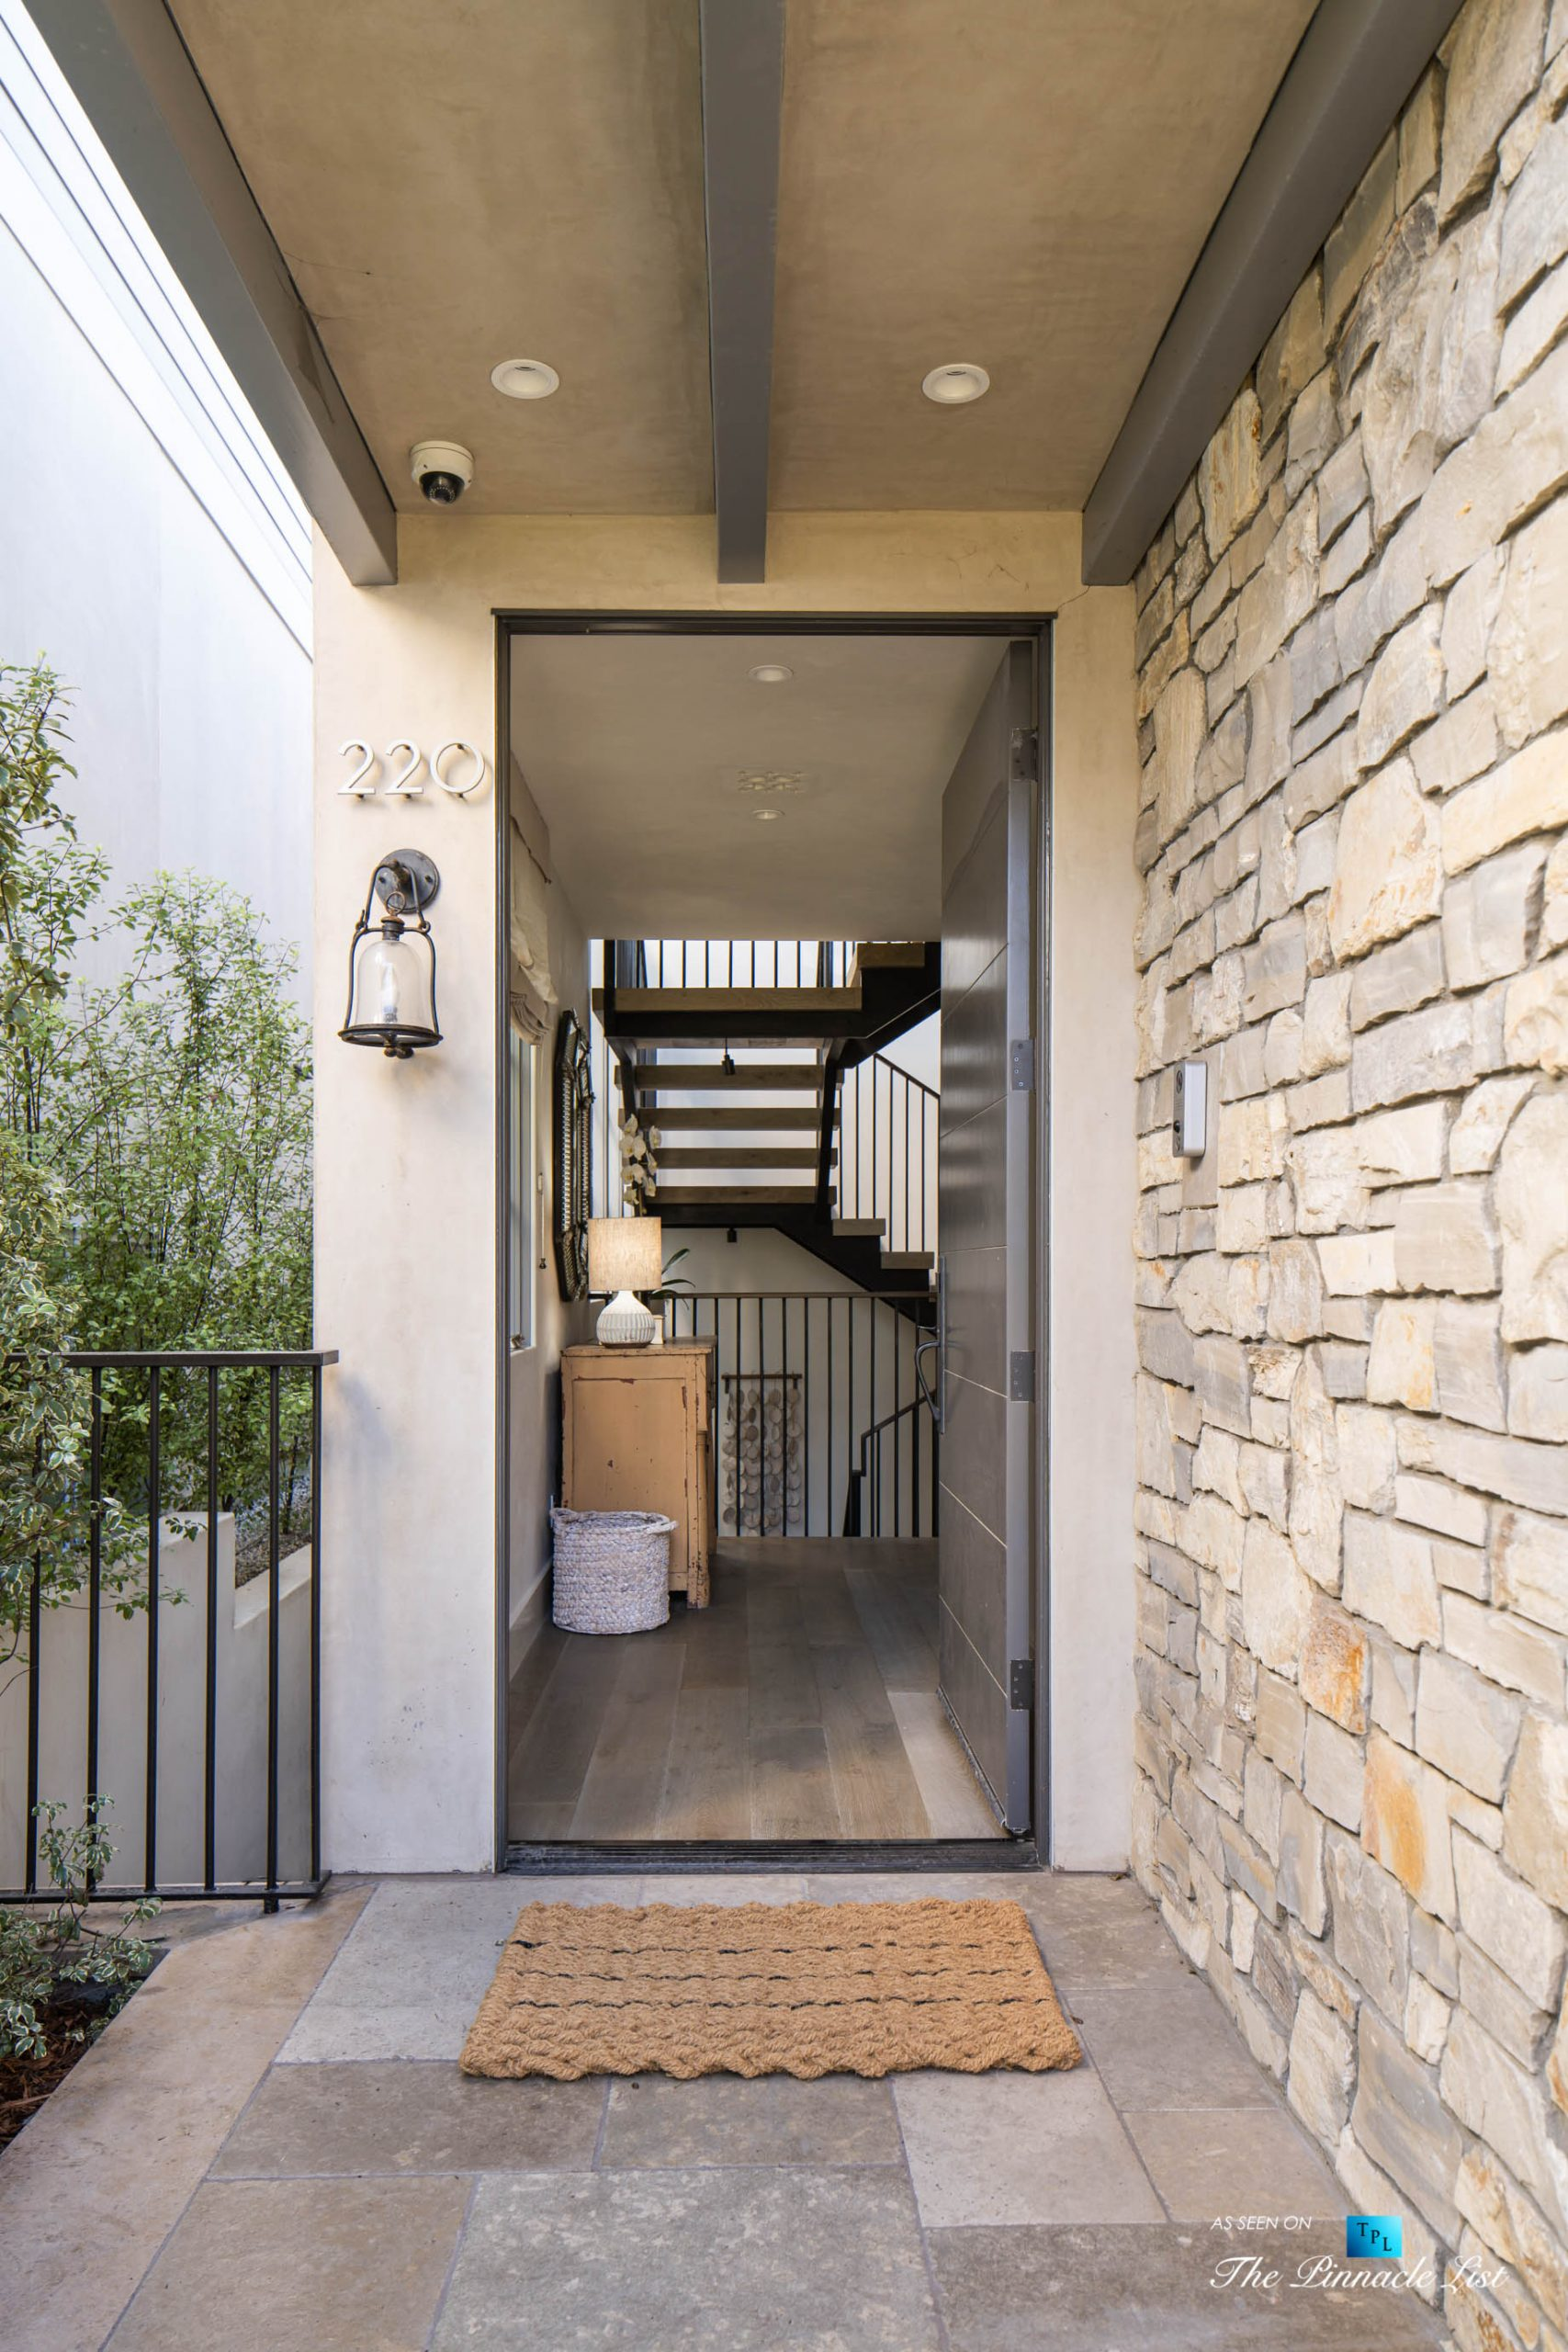 220 8th St, Manhattan Beach, CA, USA - Luxury Real Estate - Ocean View Dream Home - Front Entrance Door